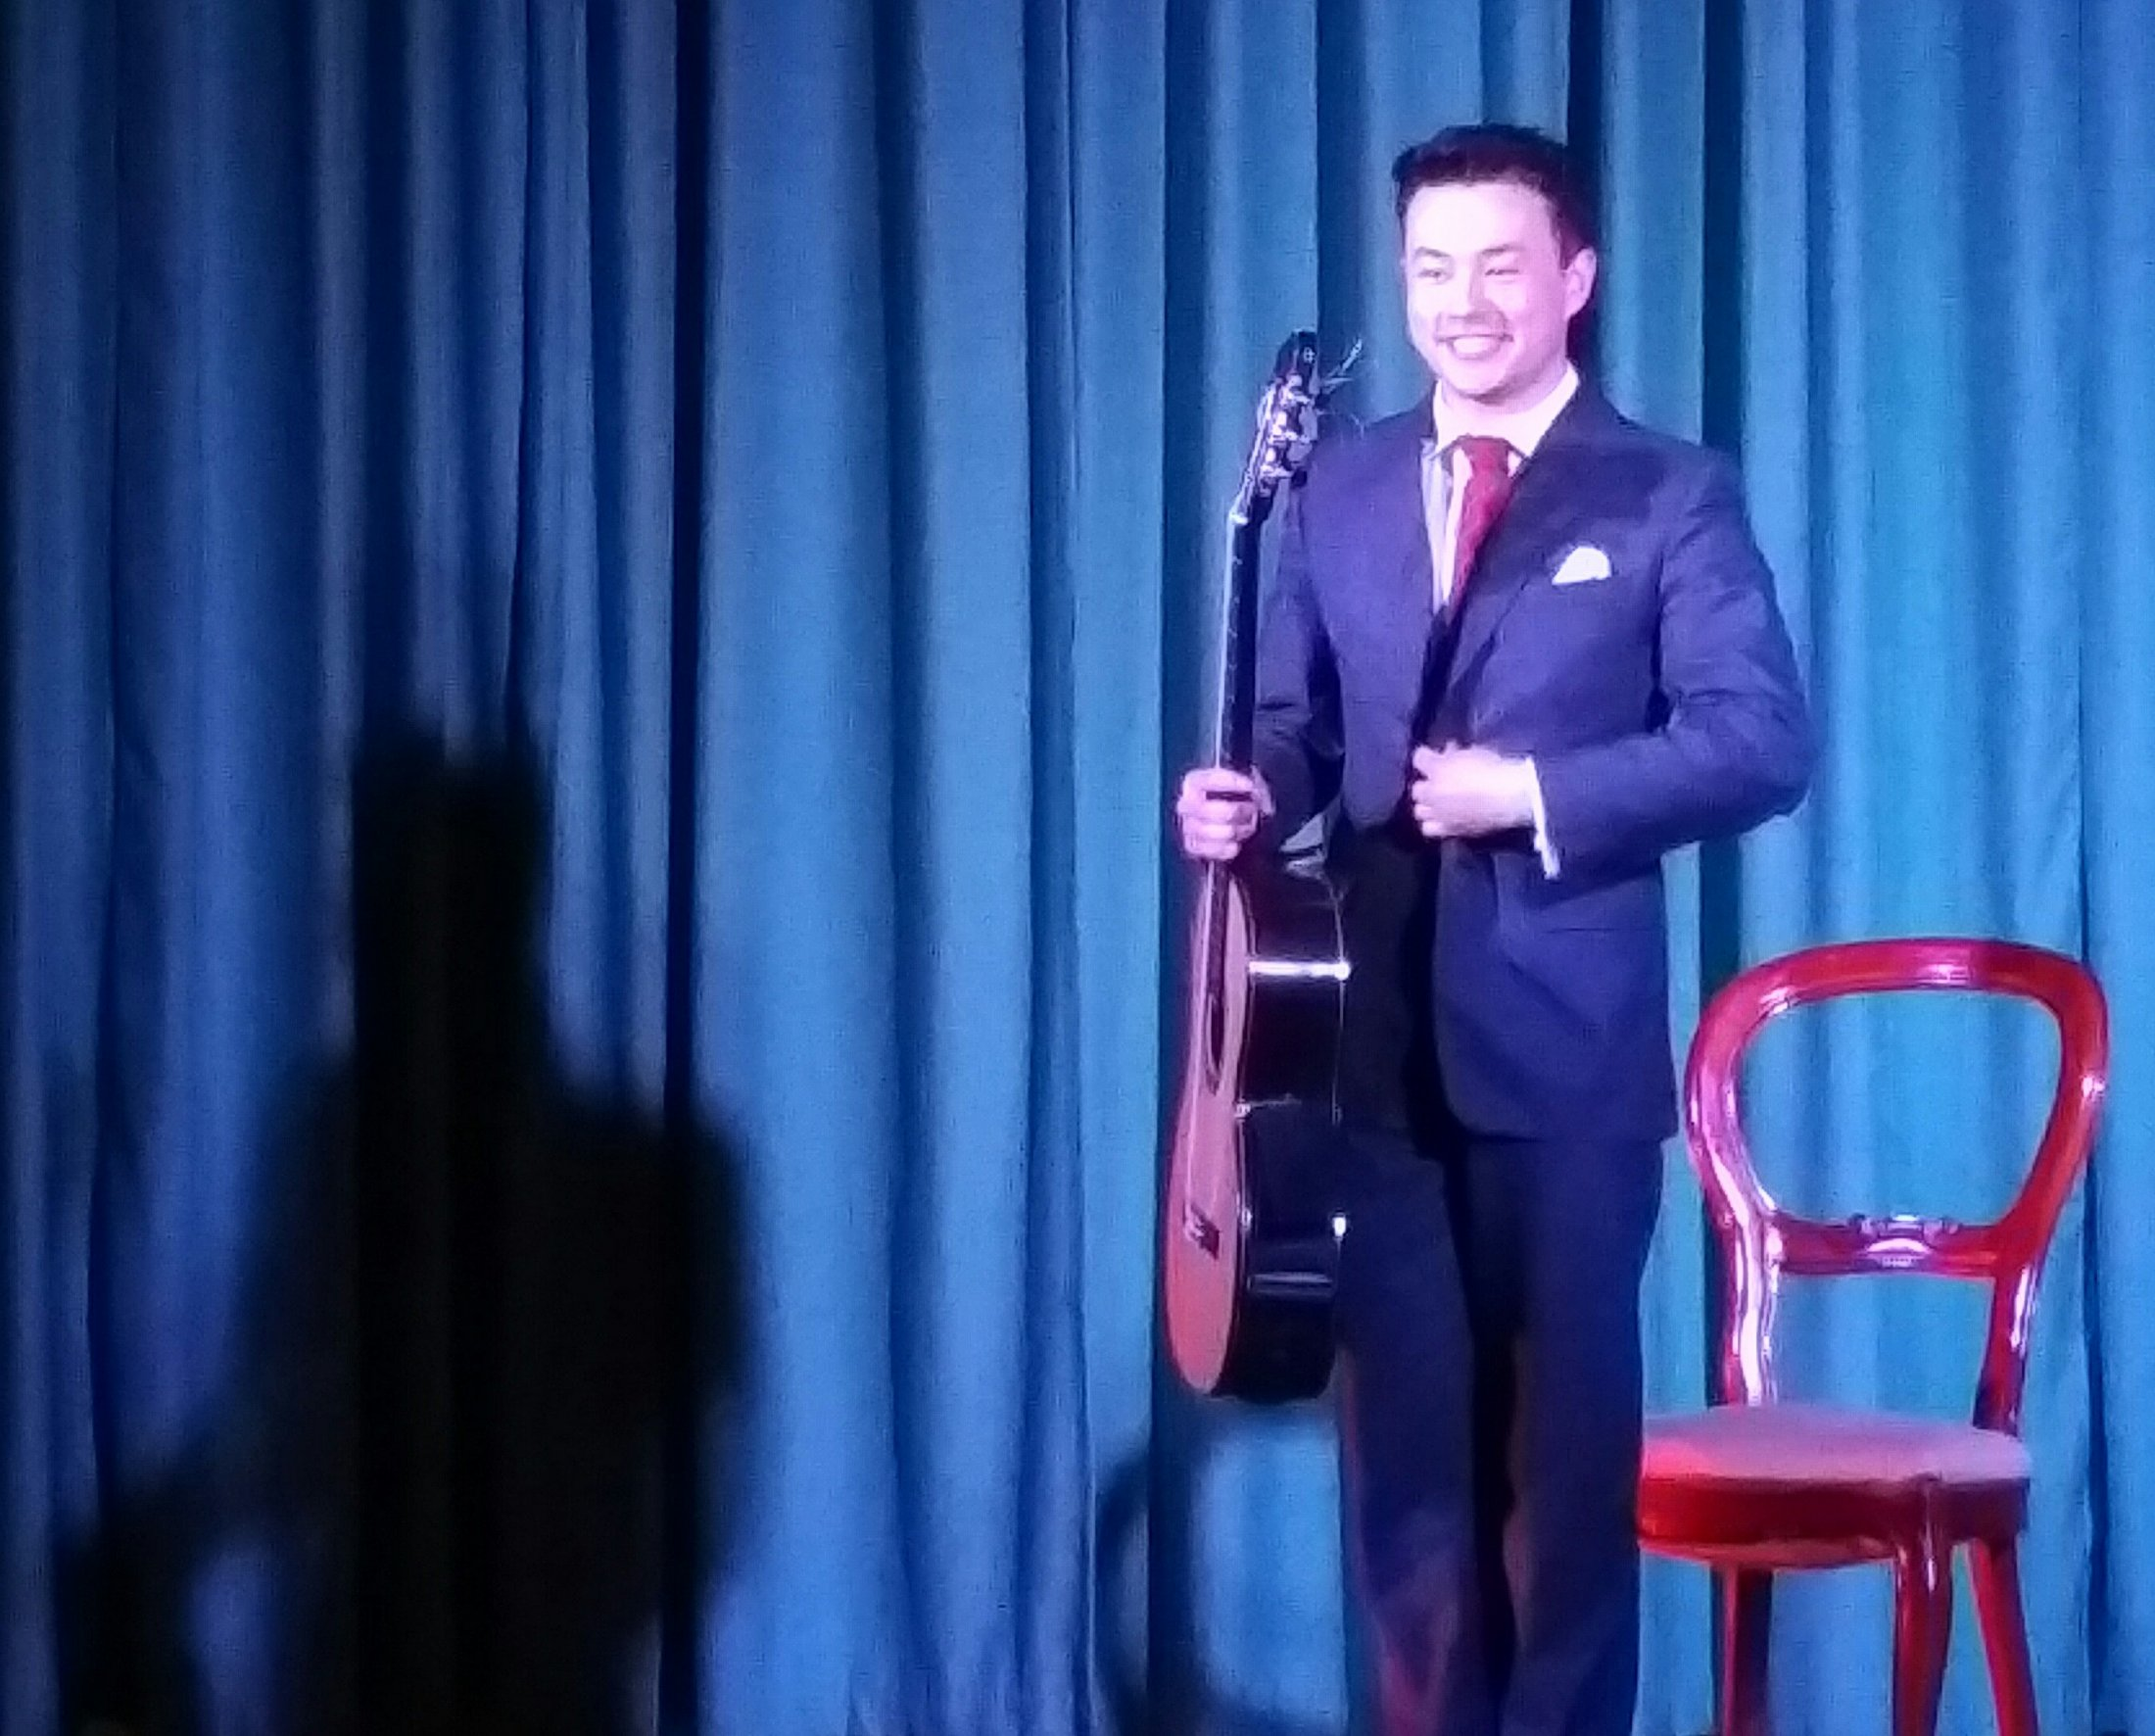 Sean Shibe, acclaimed classical guitarist